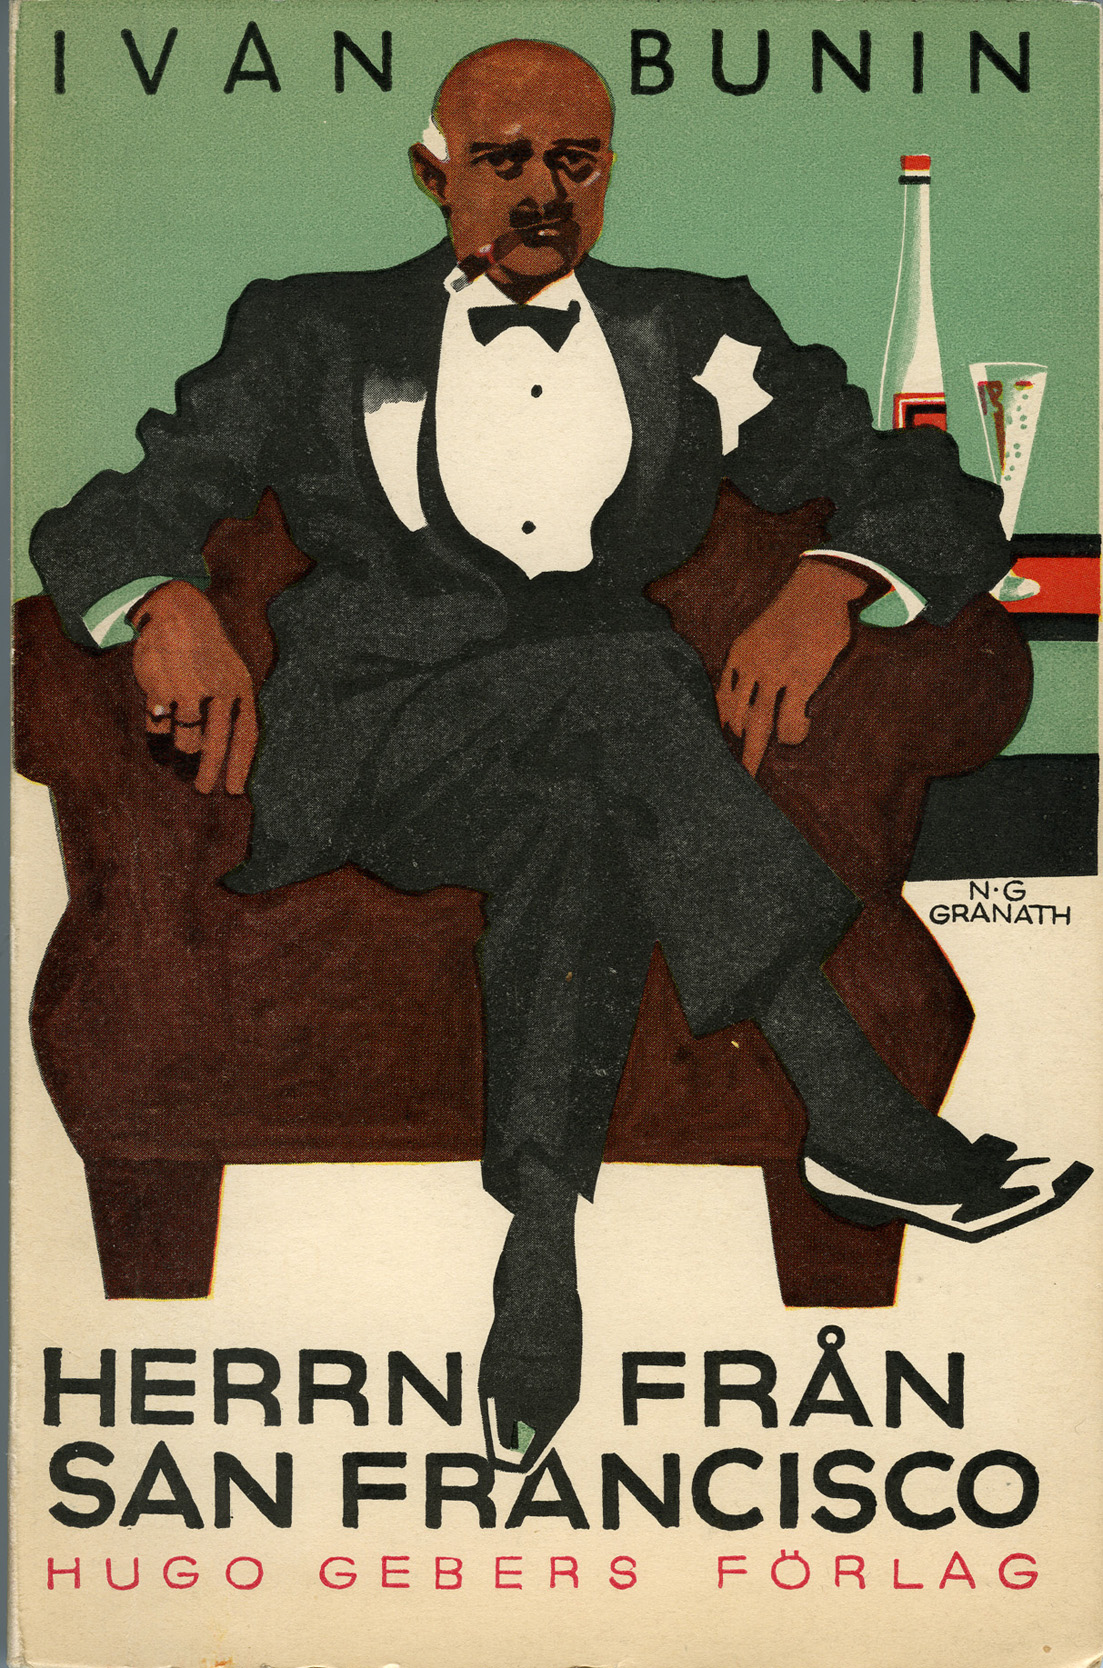 Image of Ivan Bunin, Herrn Fran San Francisco